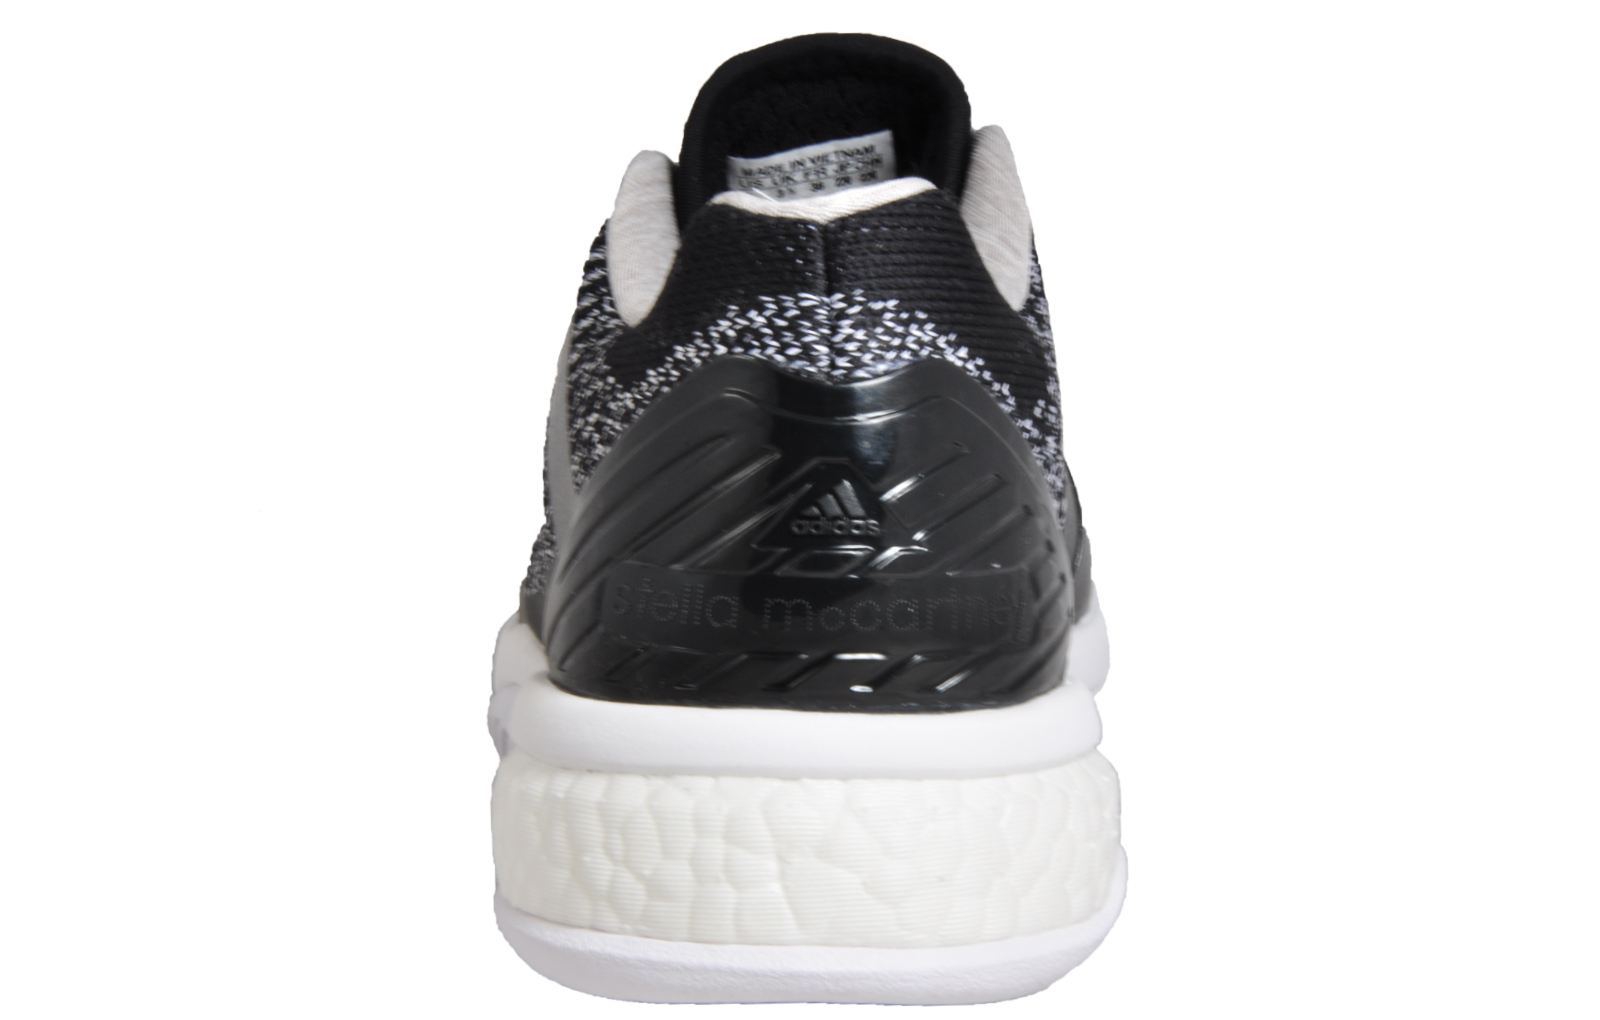 pick up 1082c 90ffb Adidas ASMC Stella McCartney Barricade Boost Women s Tennis Shoes Black